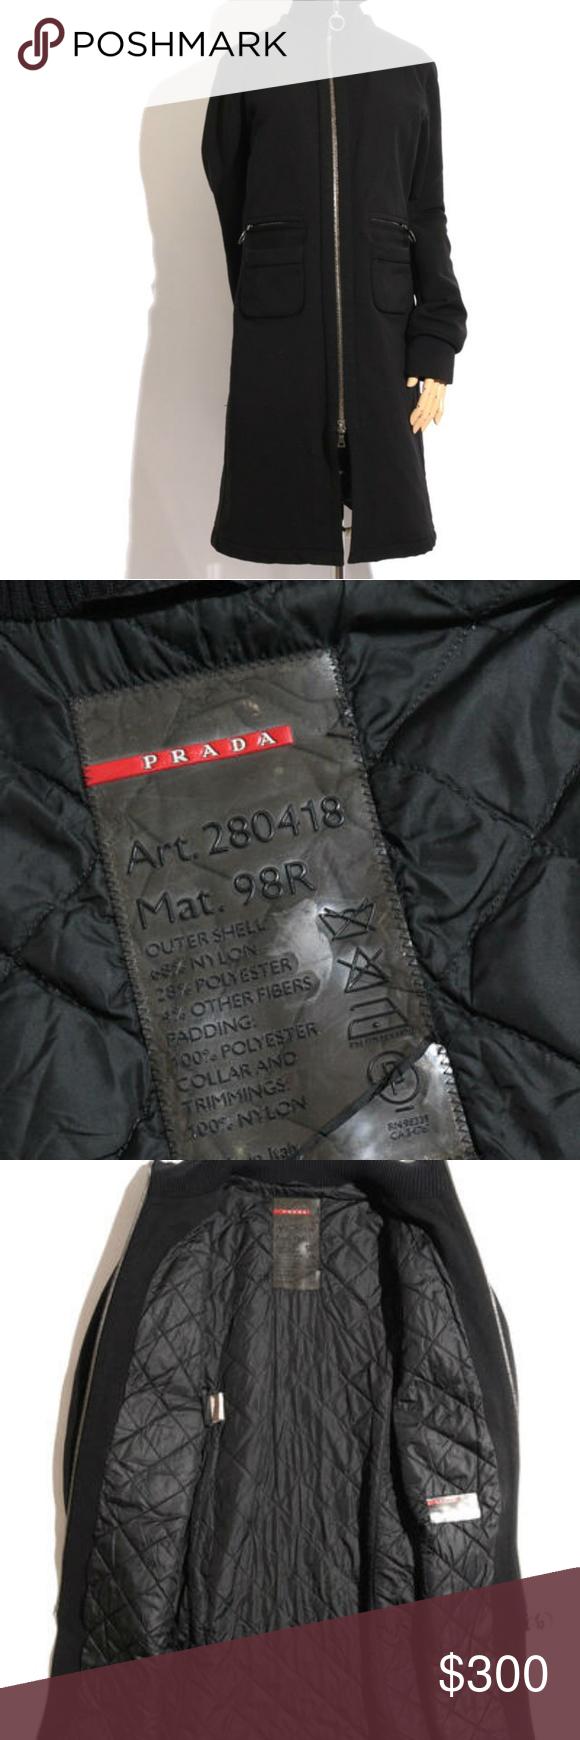 Ladies Authentic Prada Jacket Military Fashion Prada Jacket Lady [ 1740 x 580 Pixel ]